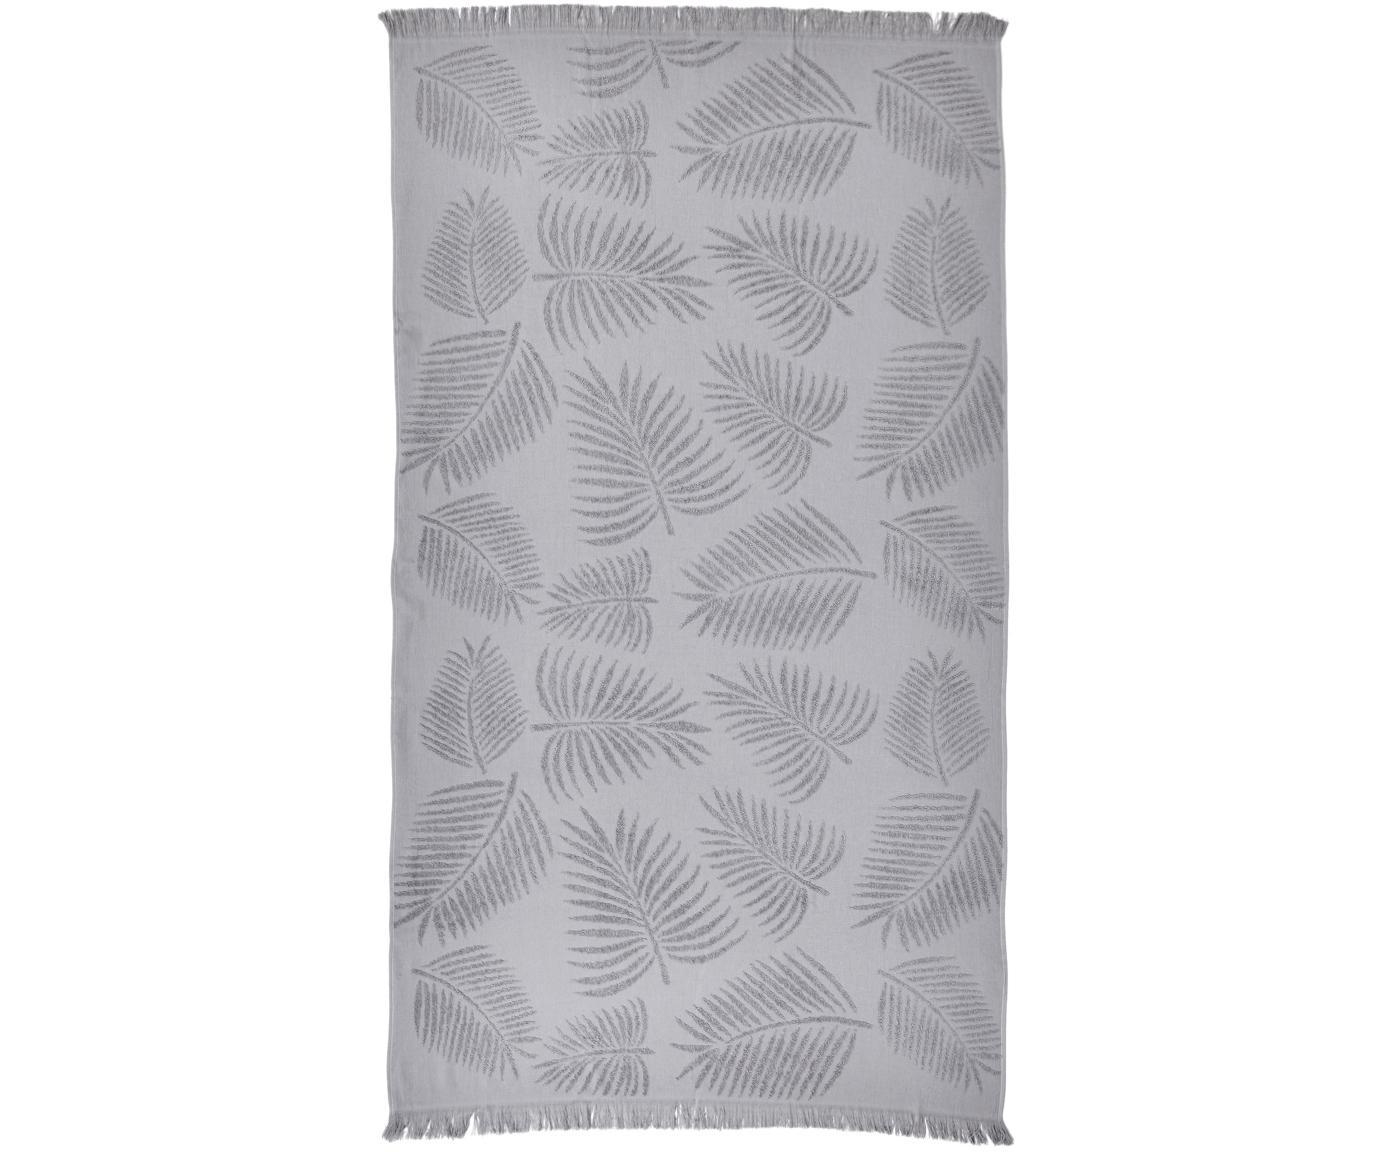 Hamamdoek Capri Palm Leaves, Katoen, lichte kwaliteit, 300 g/m², Zilvergrijs, 90 x 160 cm